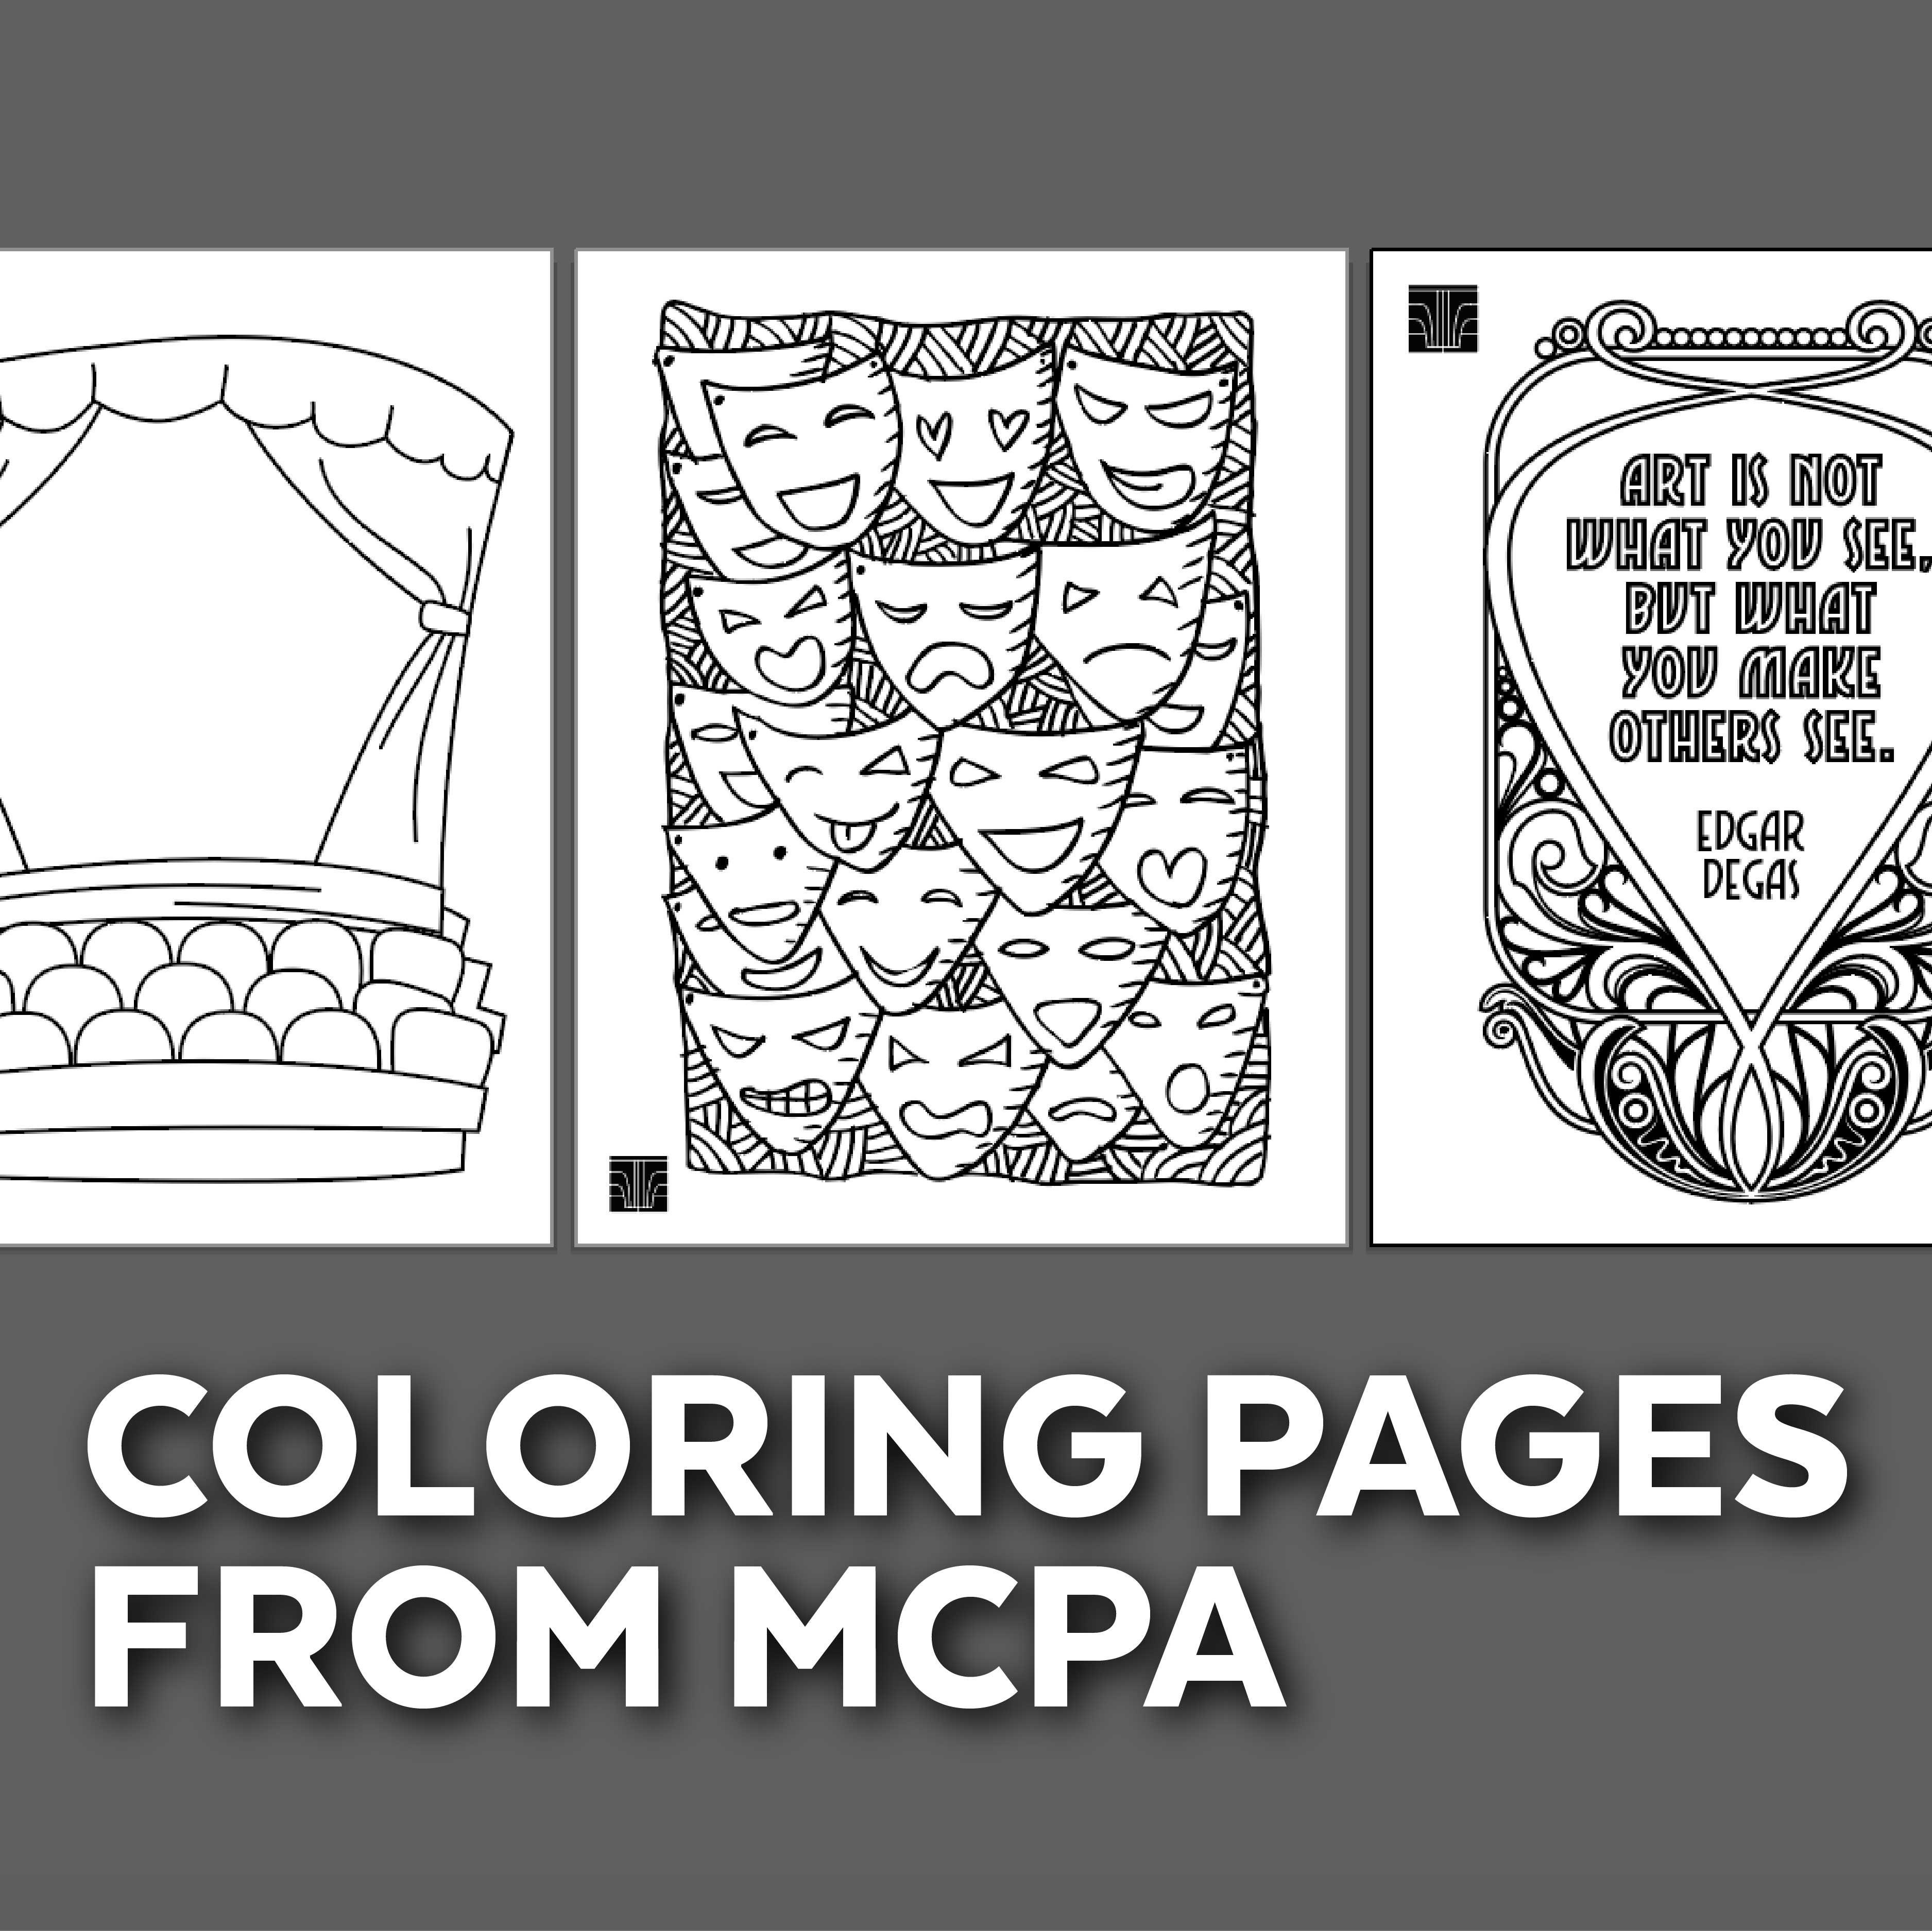 ColoringPages-02.jpg